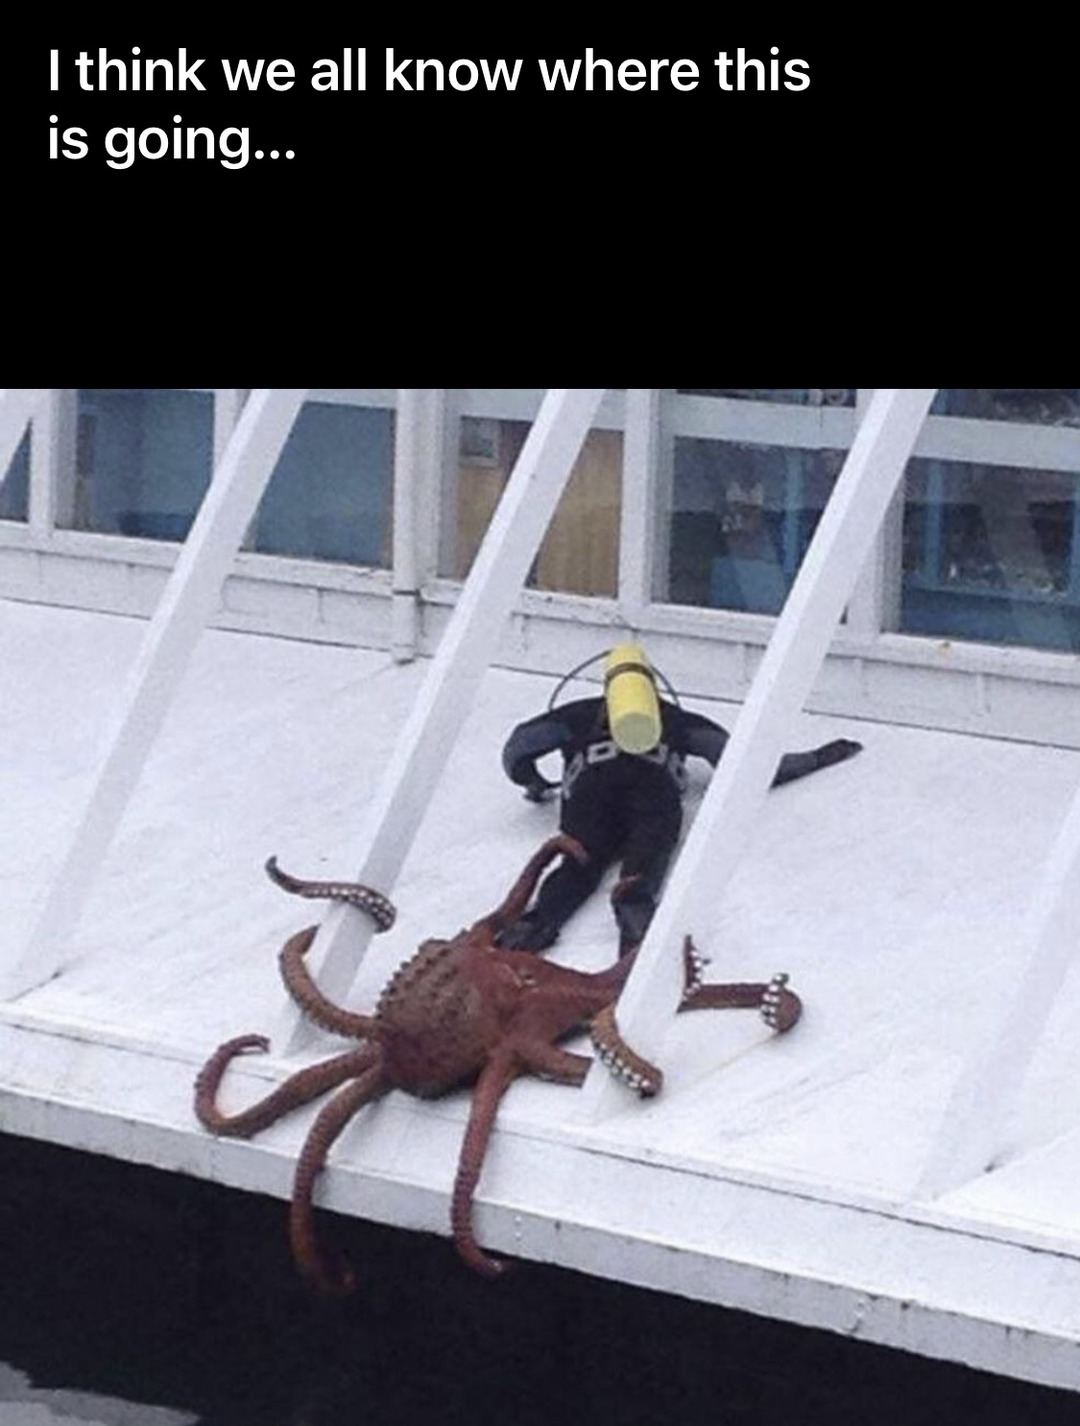 Squidy-chan noooooo - meme